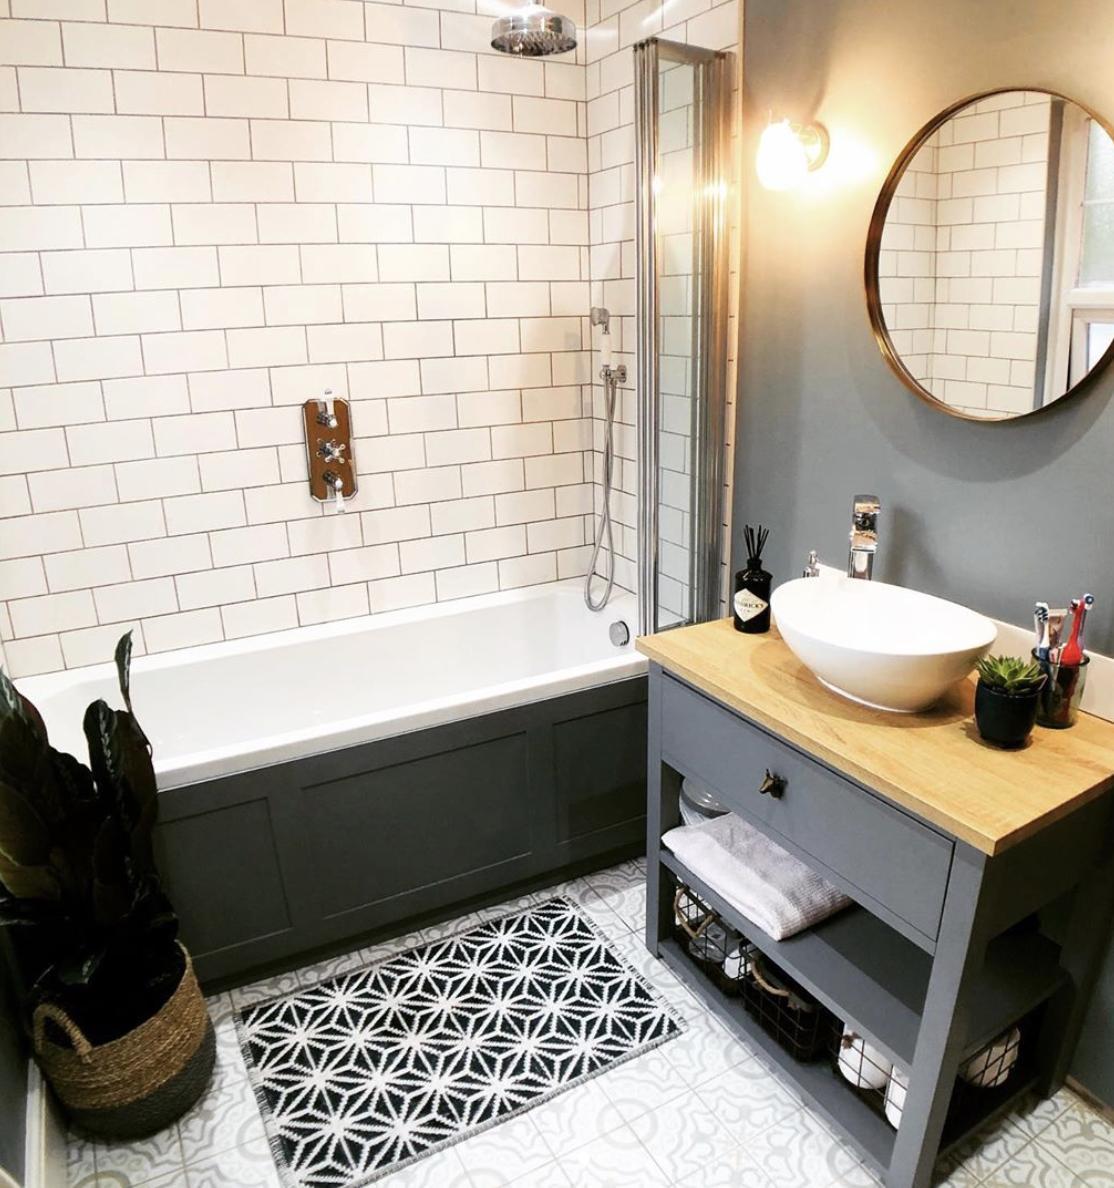 N C Tiles Bathrooms On Twitter Another Fantastic Tiling Job Completed Using Our Nicobond White Wall Tiles Https T Co 0u4wumo9fs Tiling Tiler Tilingjob Bathroom Bathroomtransformation Bathroominspo Tileinspo Ihavethisthingwithtiles